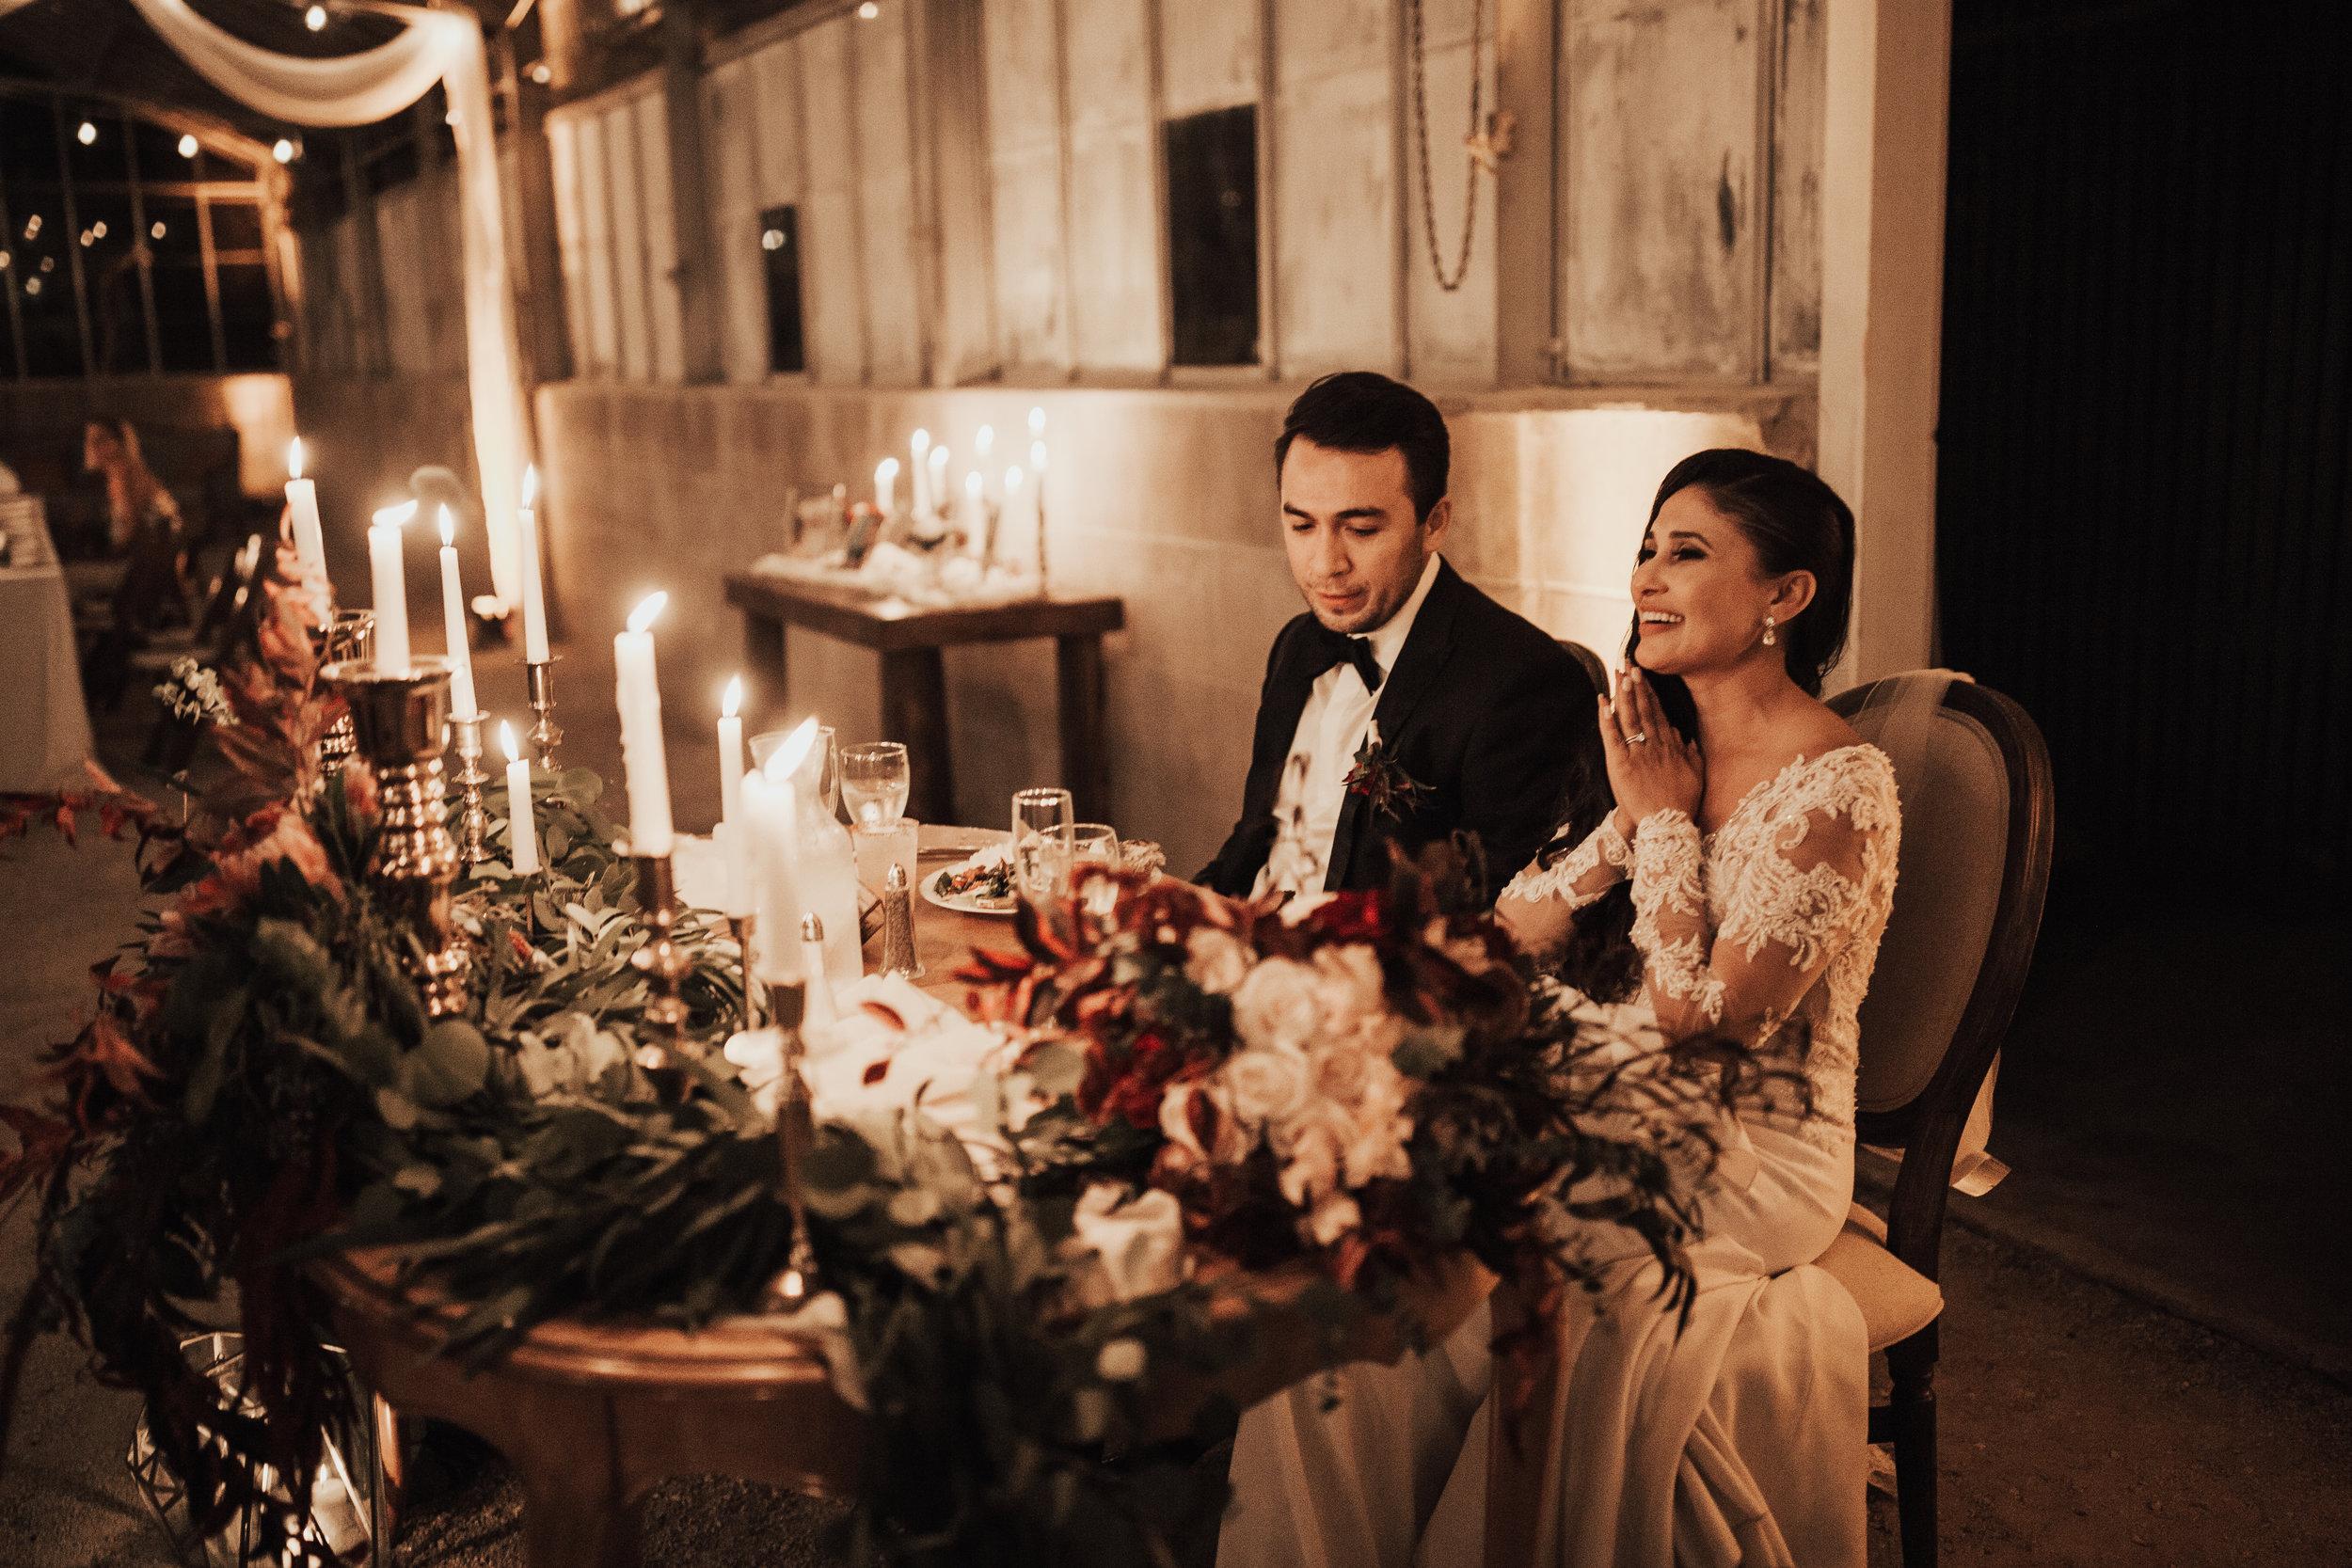 JessicaVictor-SantaBarbara-OrchidFarms-Wedding-768.jpg